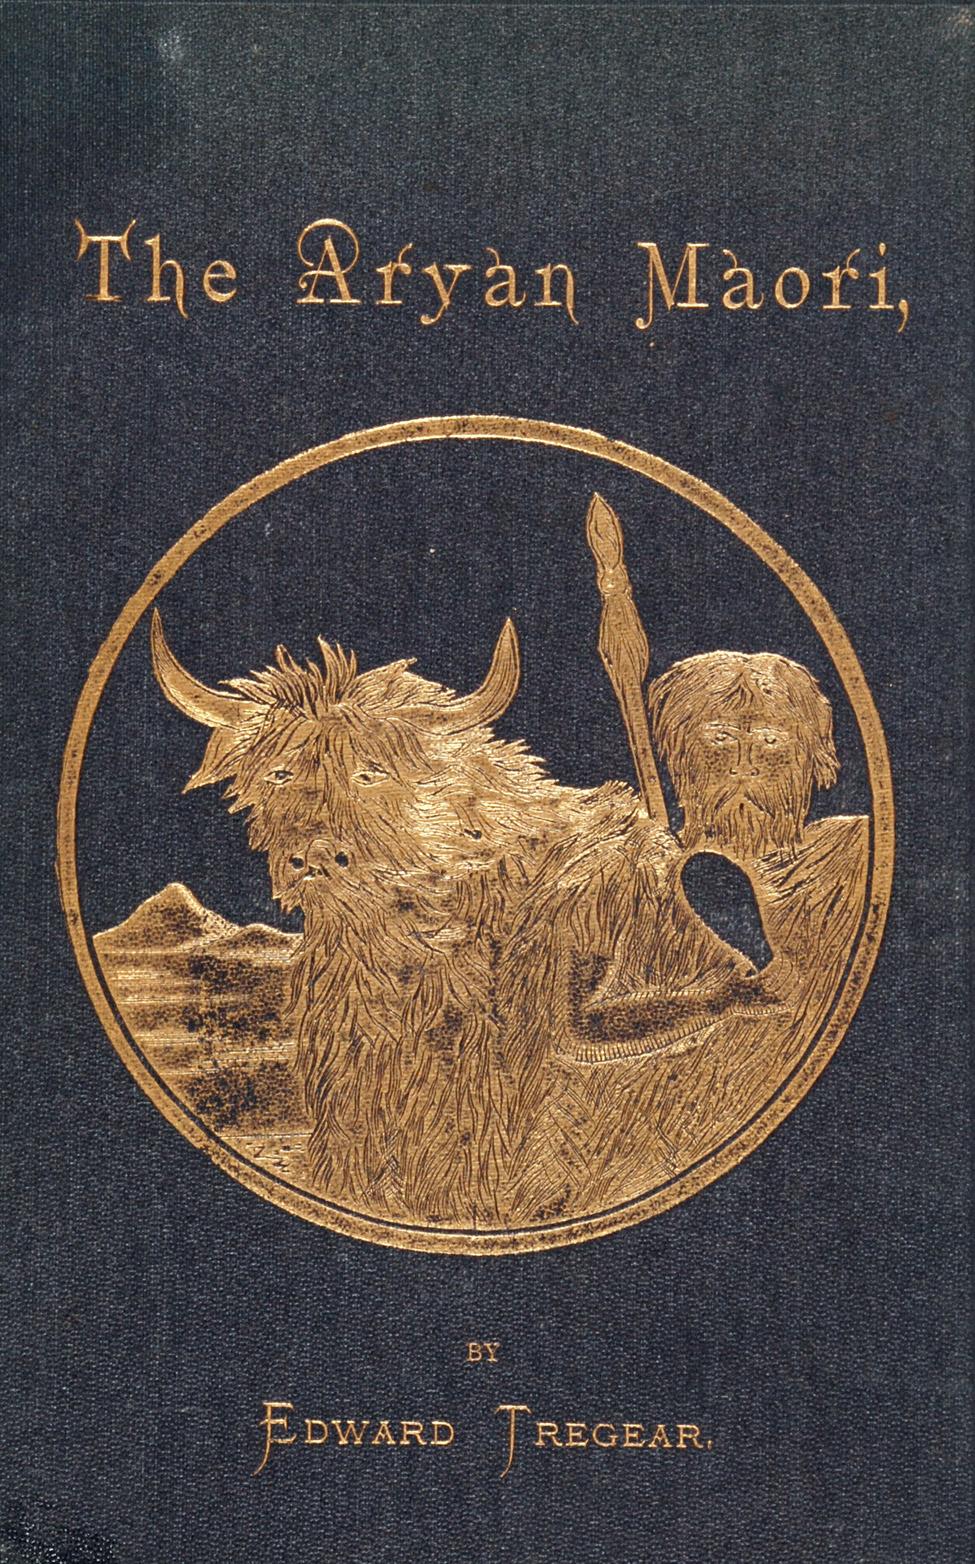 Edward Tregear. <i>The Aryan Maori. </i> Wellington: George Didsbury, 1885.